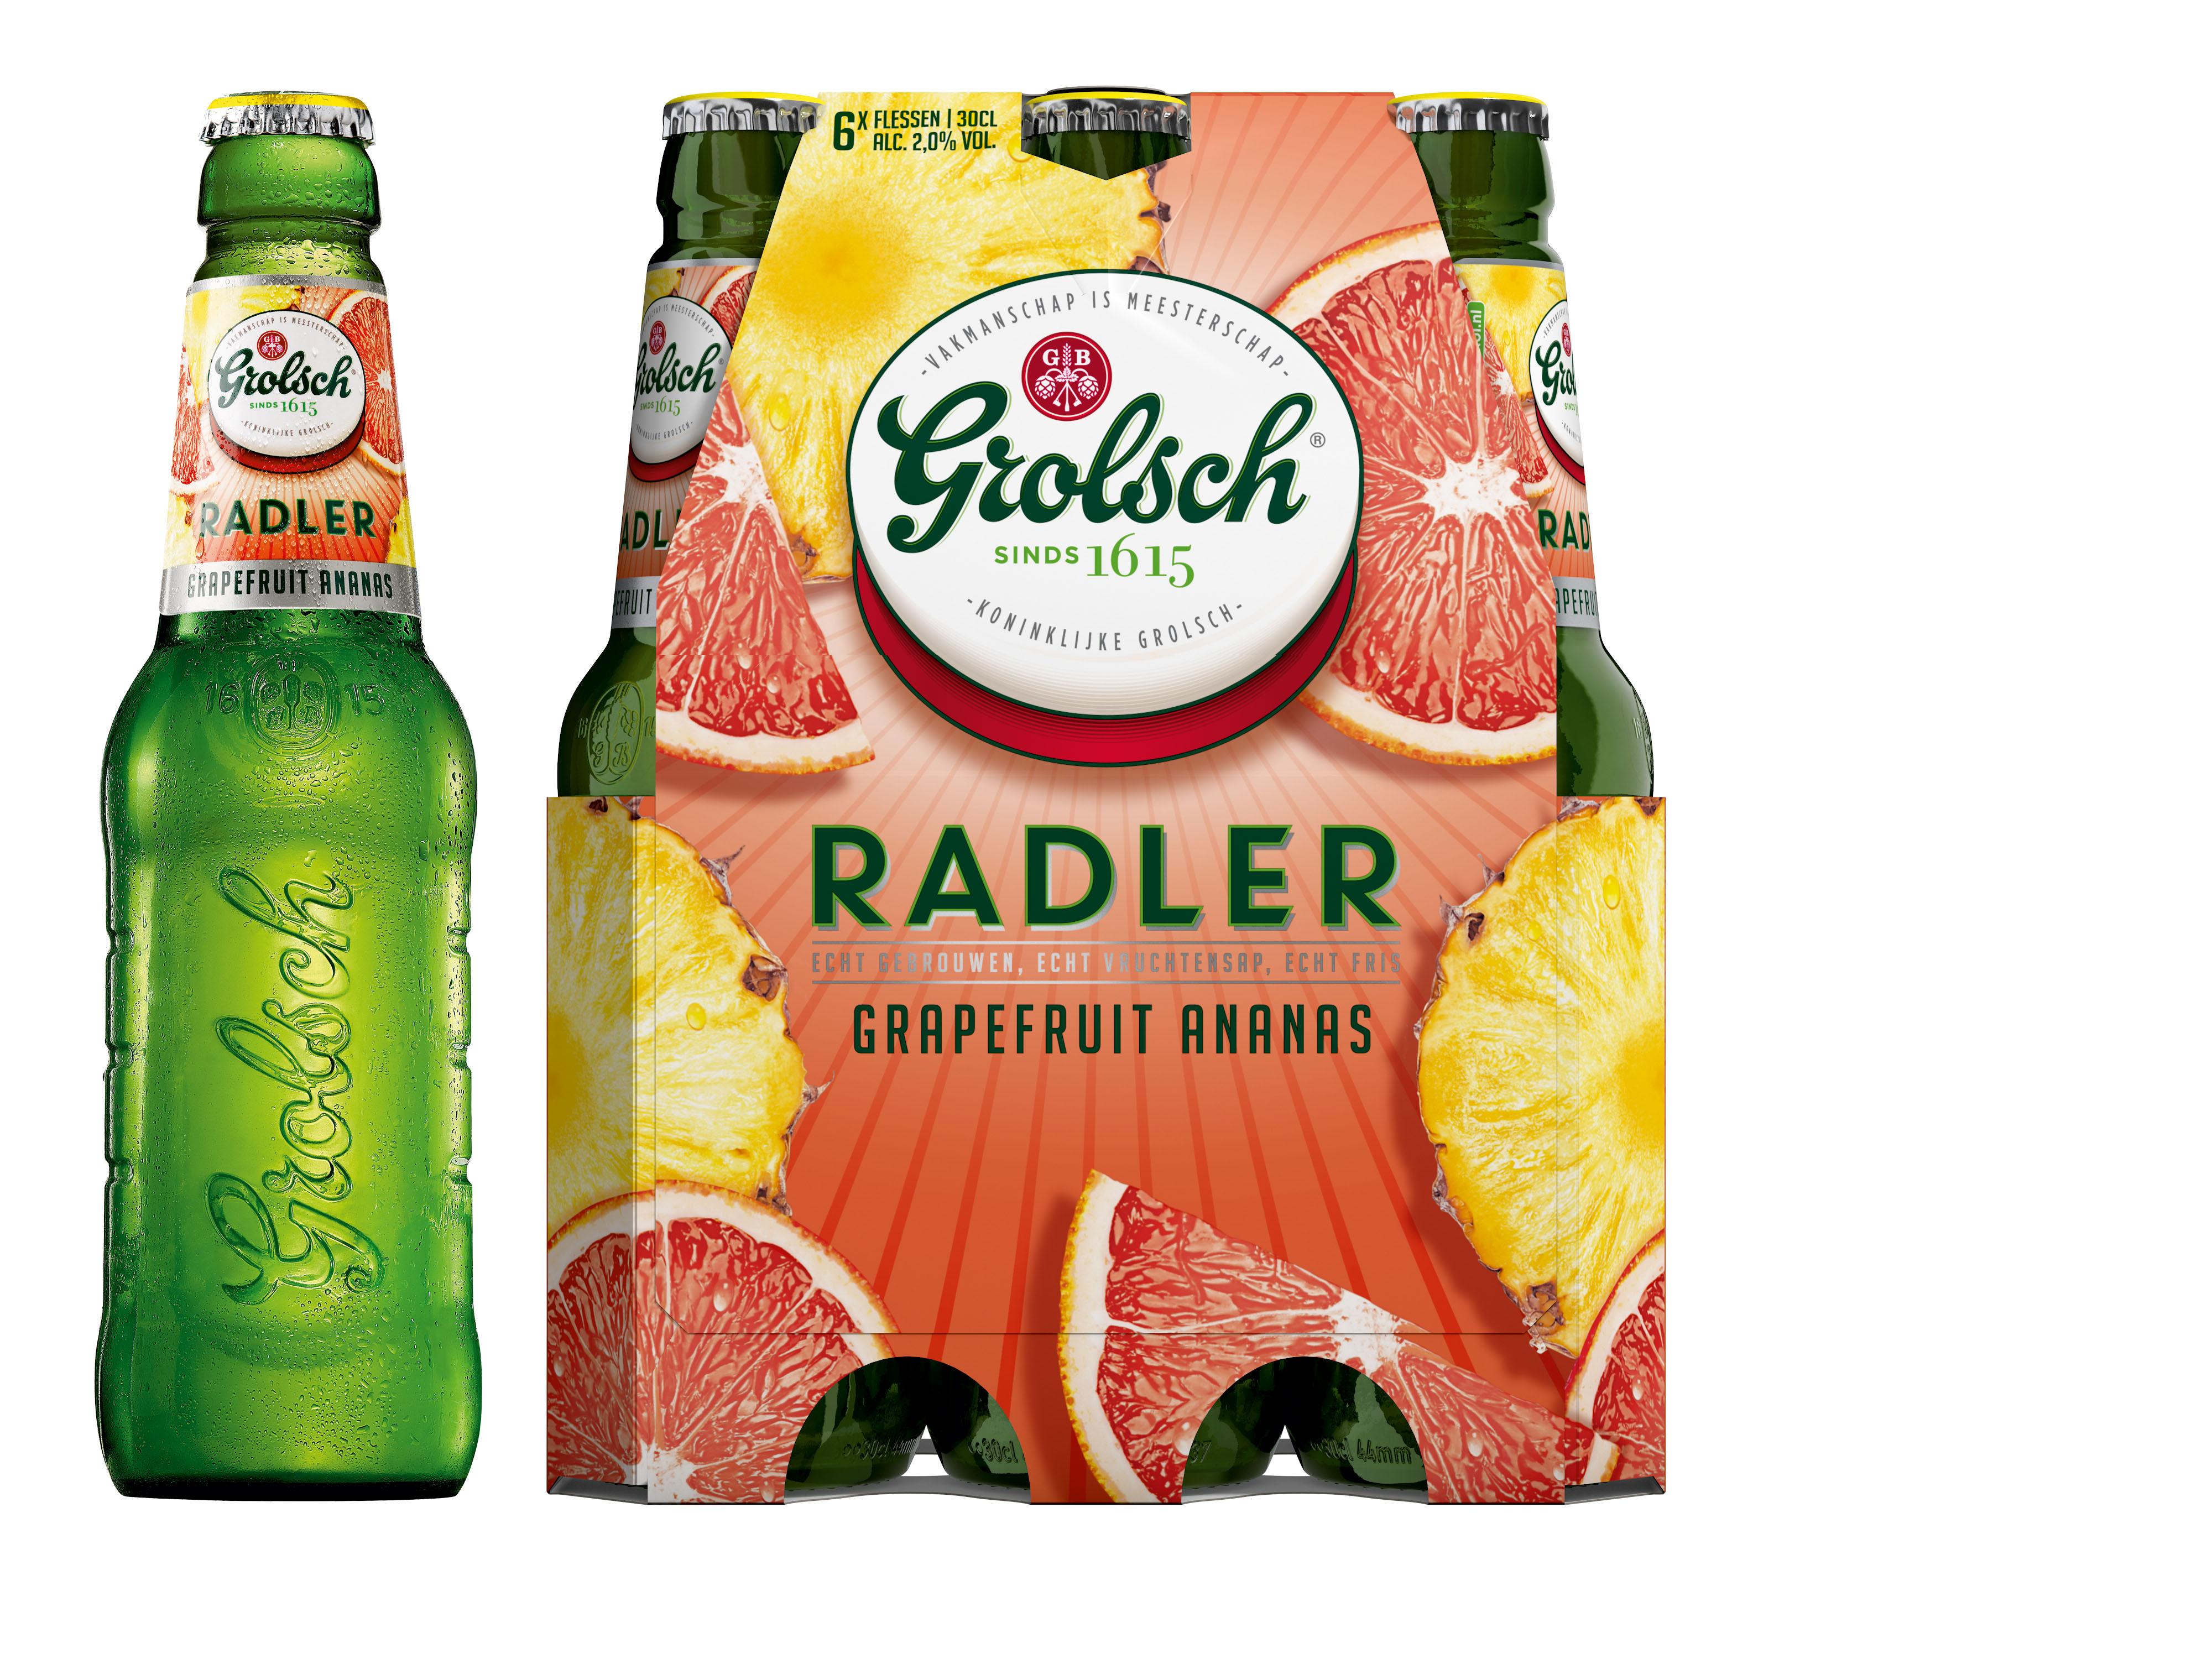 Radler Grapefruit Ananas